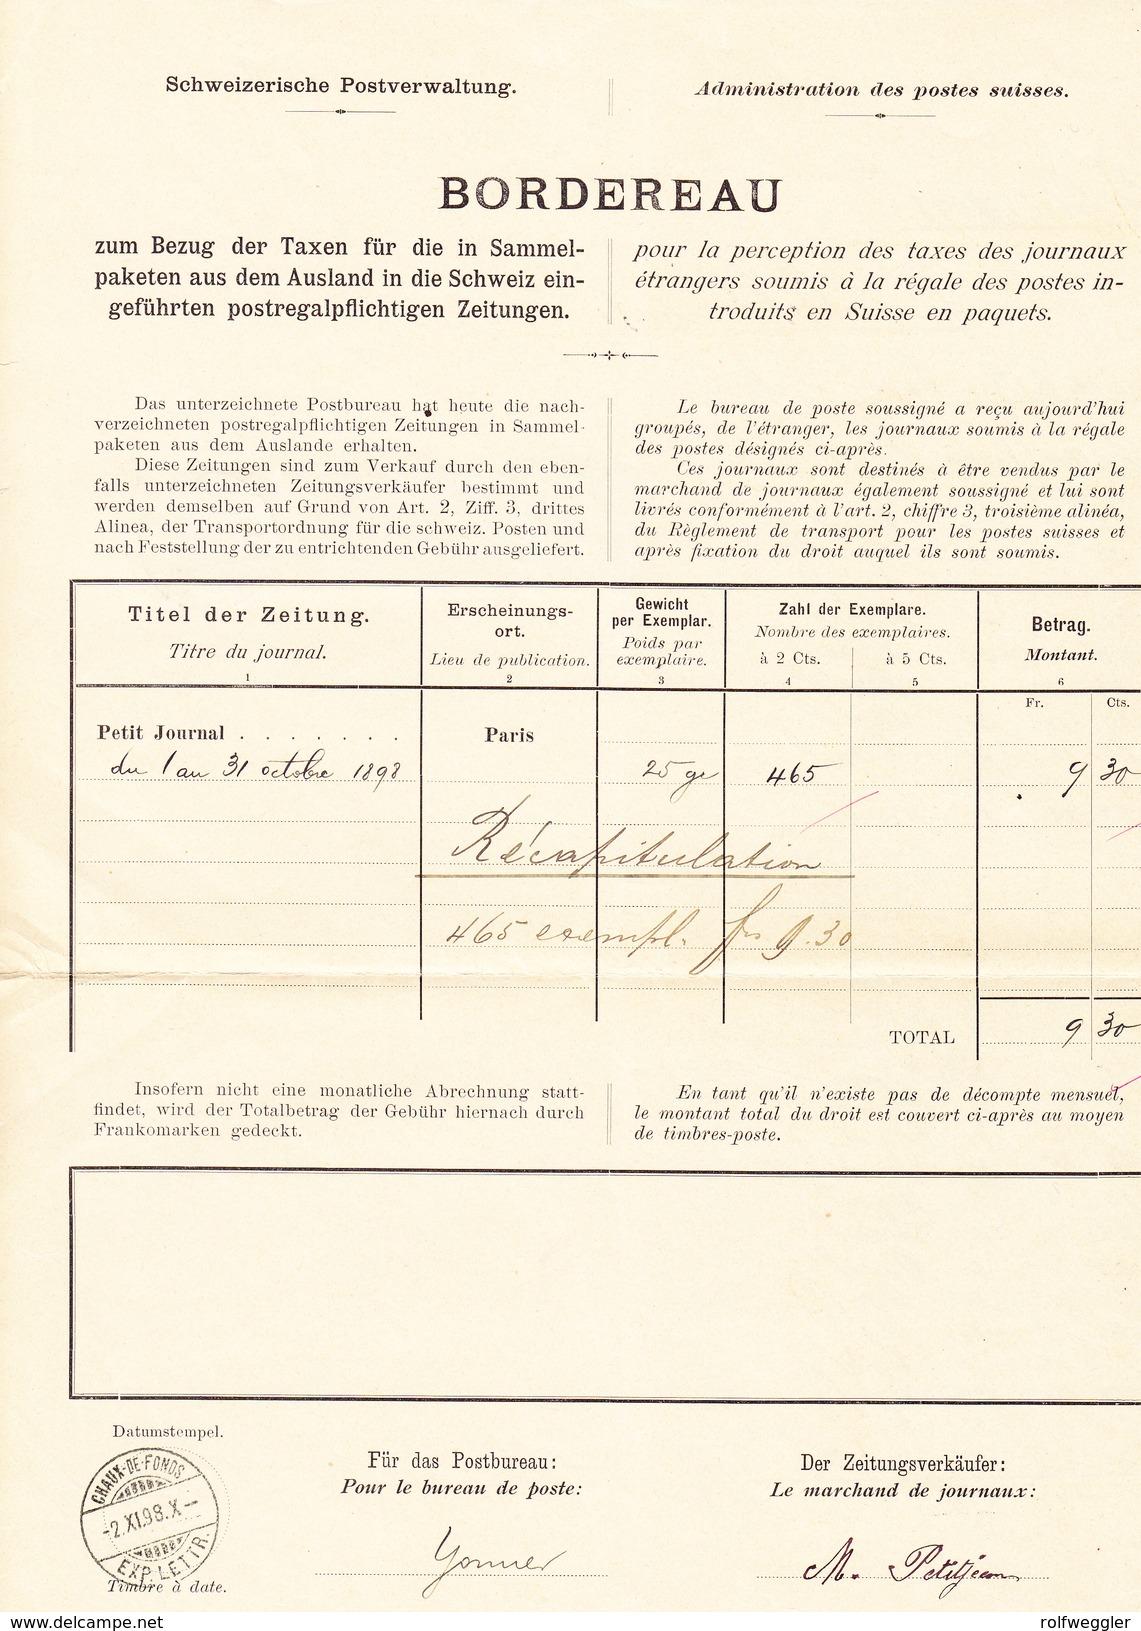 Schweiz Stehende 30Rp, 3Fr. (3) Chaux-de-Fonds 2.11.1898 Auf Postverwaltung Bordereau - 1882-1906 Armoiries, Helvetia Debout & UPU